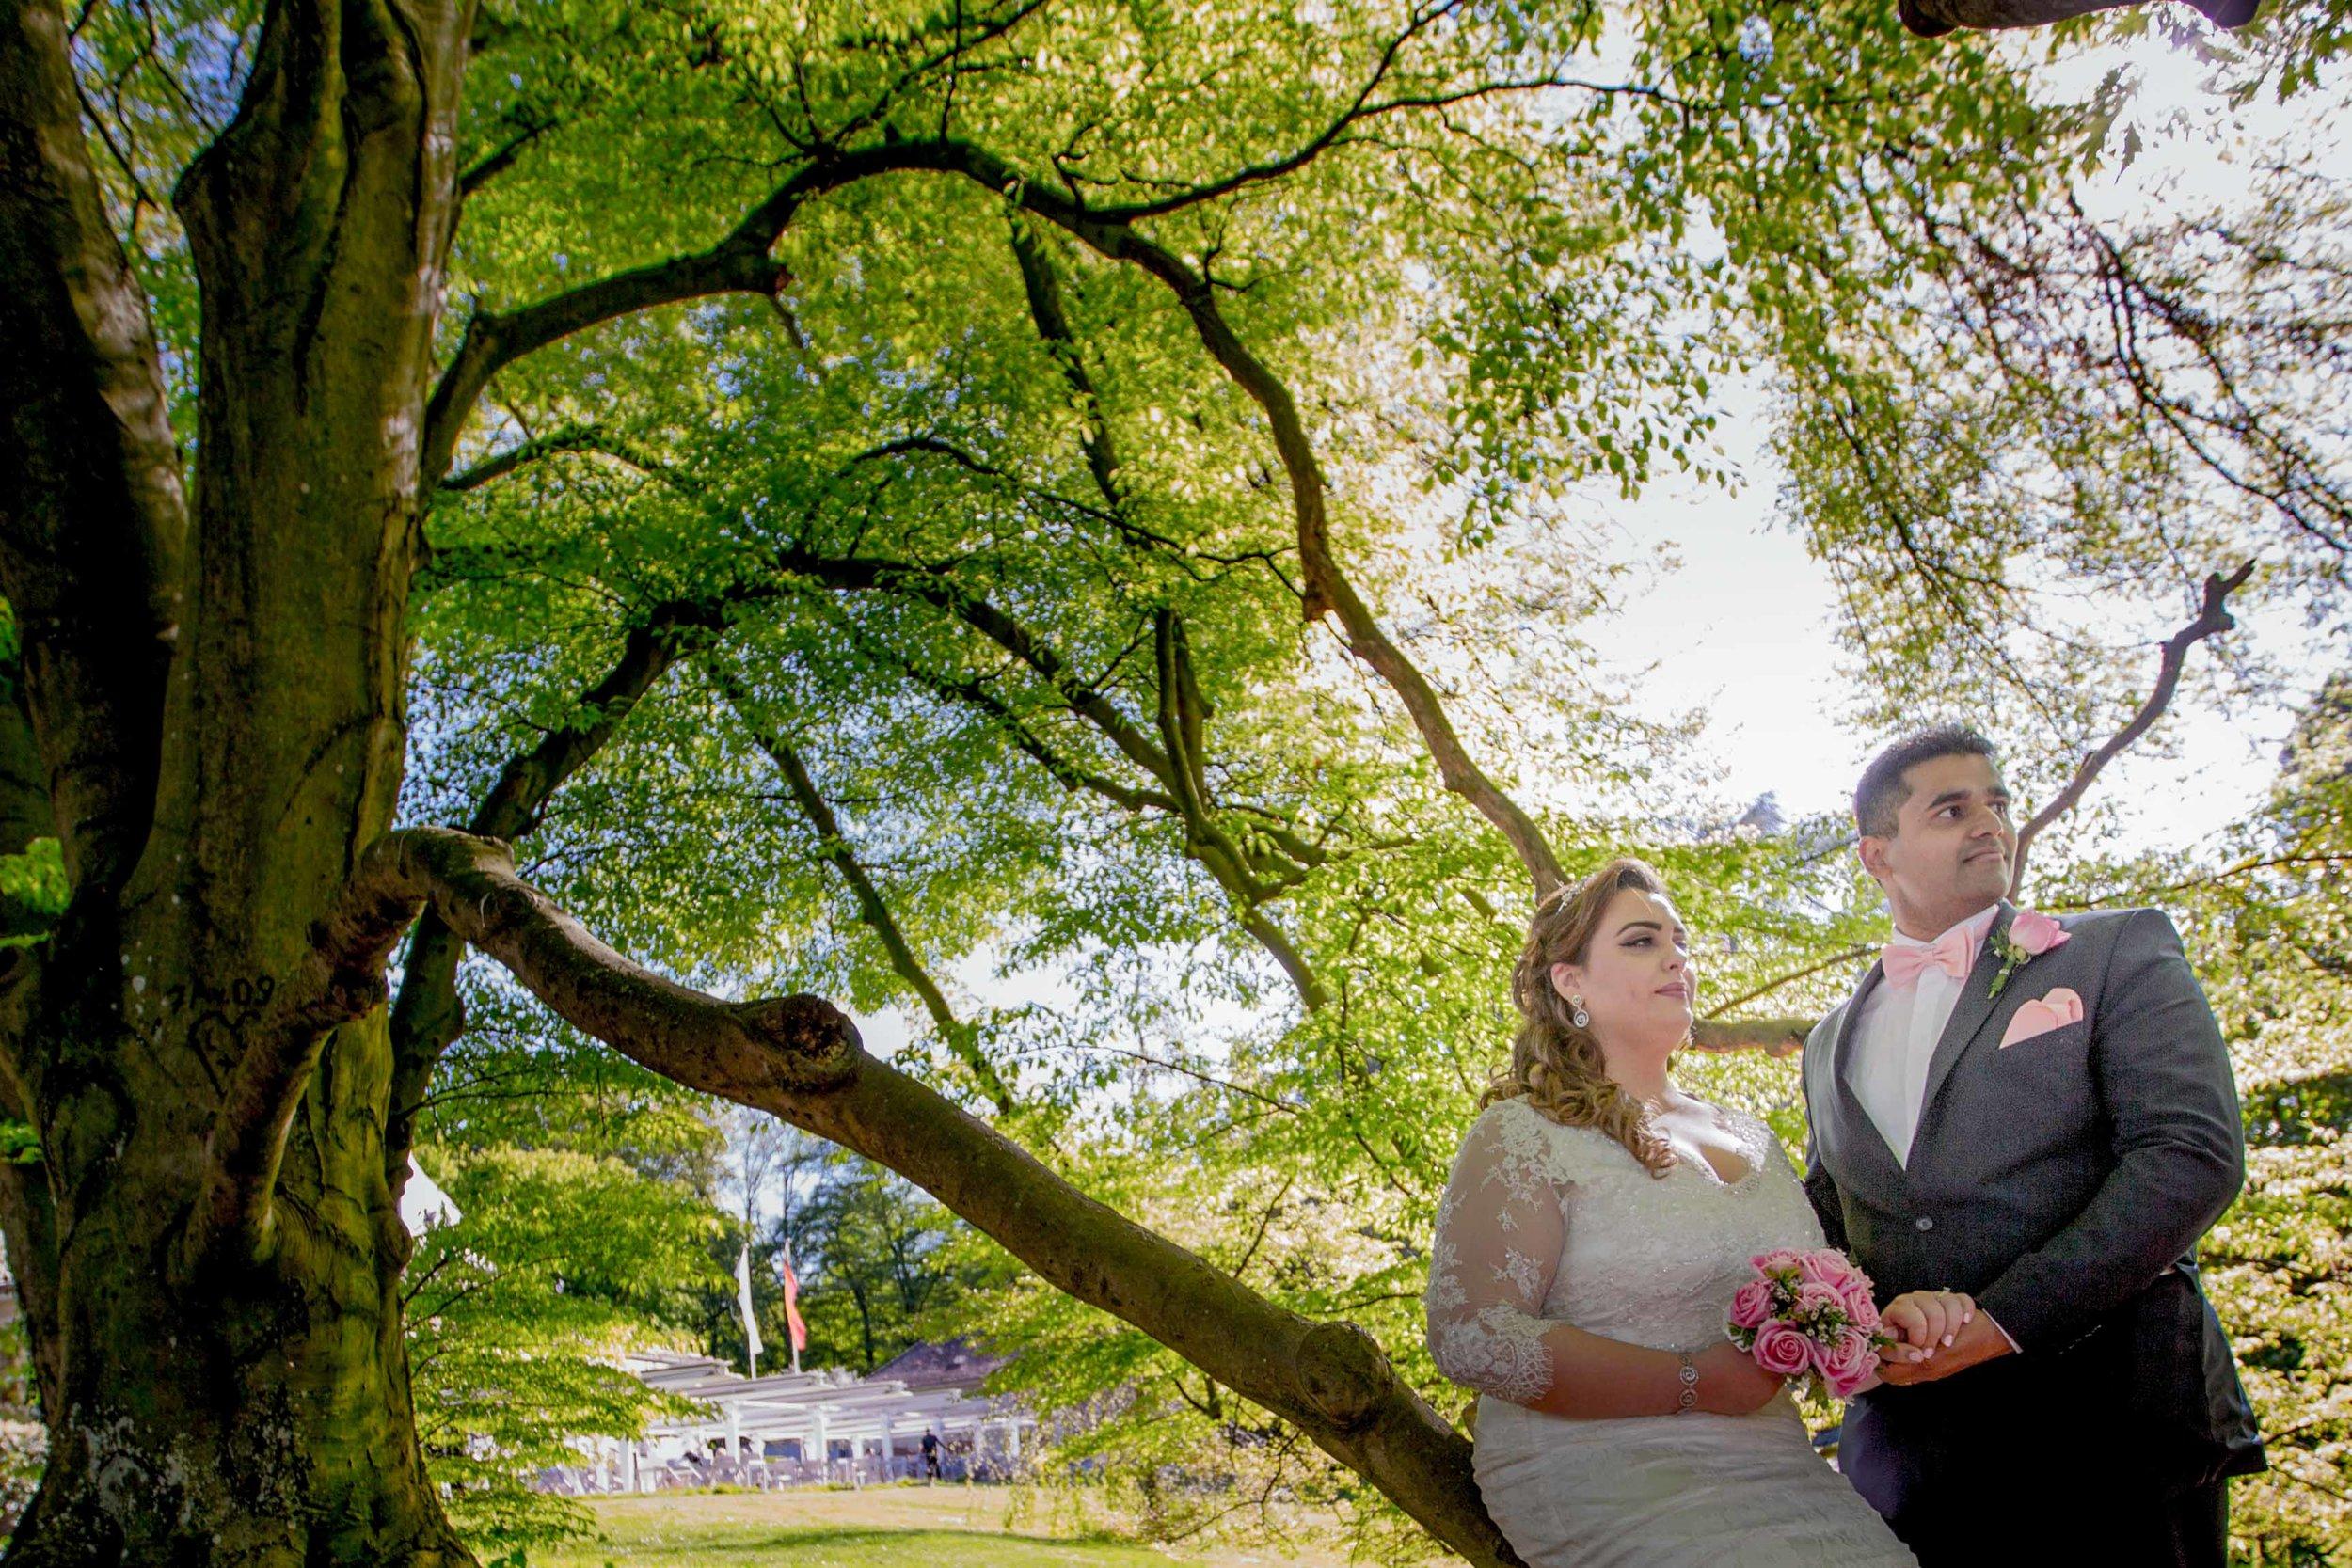 parc-des-eaux-vives-destination-wedding-photographer-geneva-switzerland-natalia-smith-photography-34.jpg